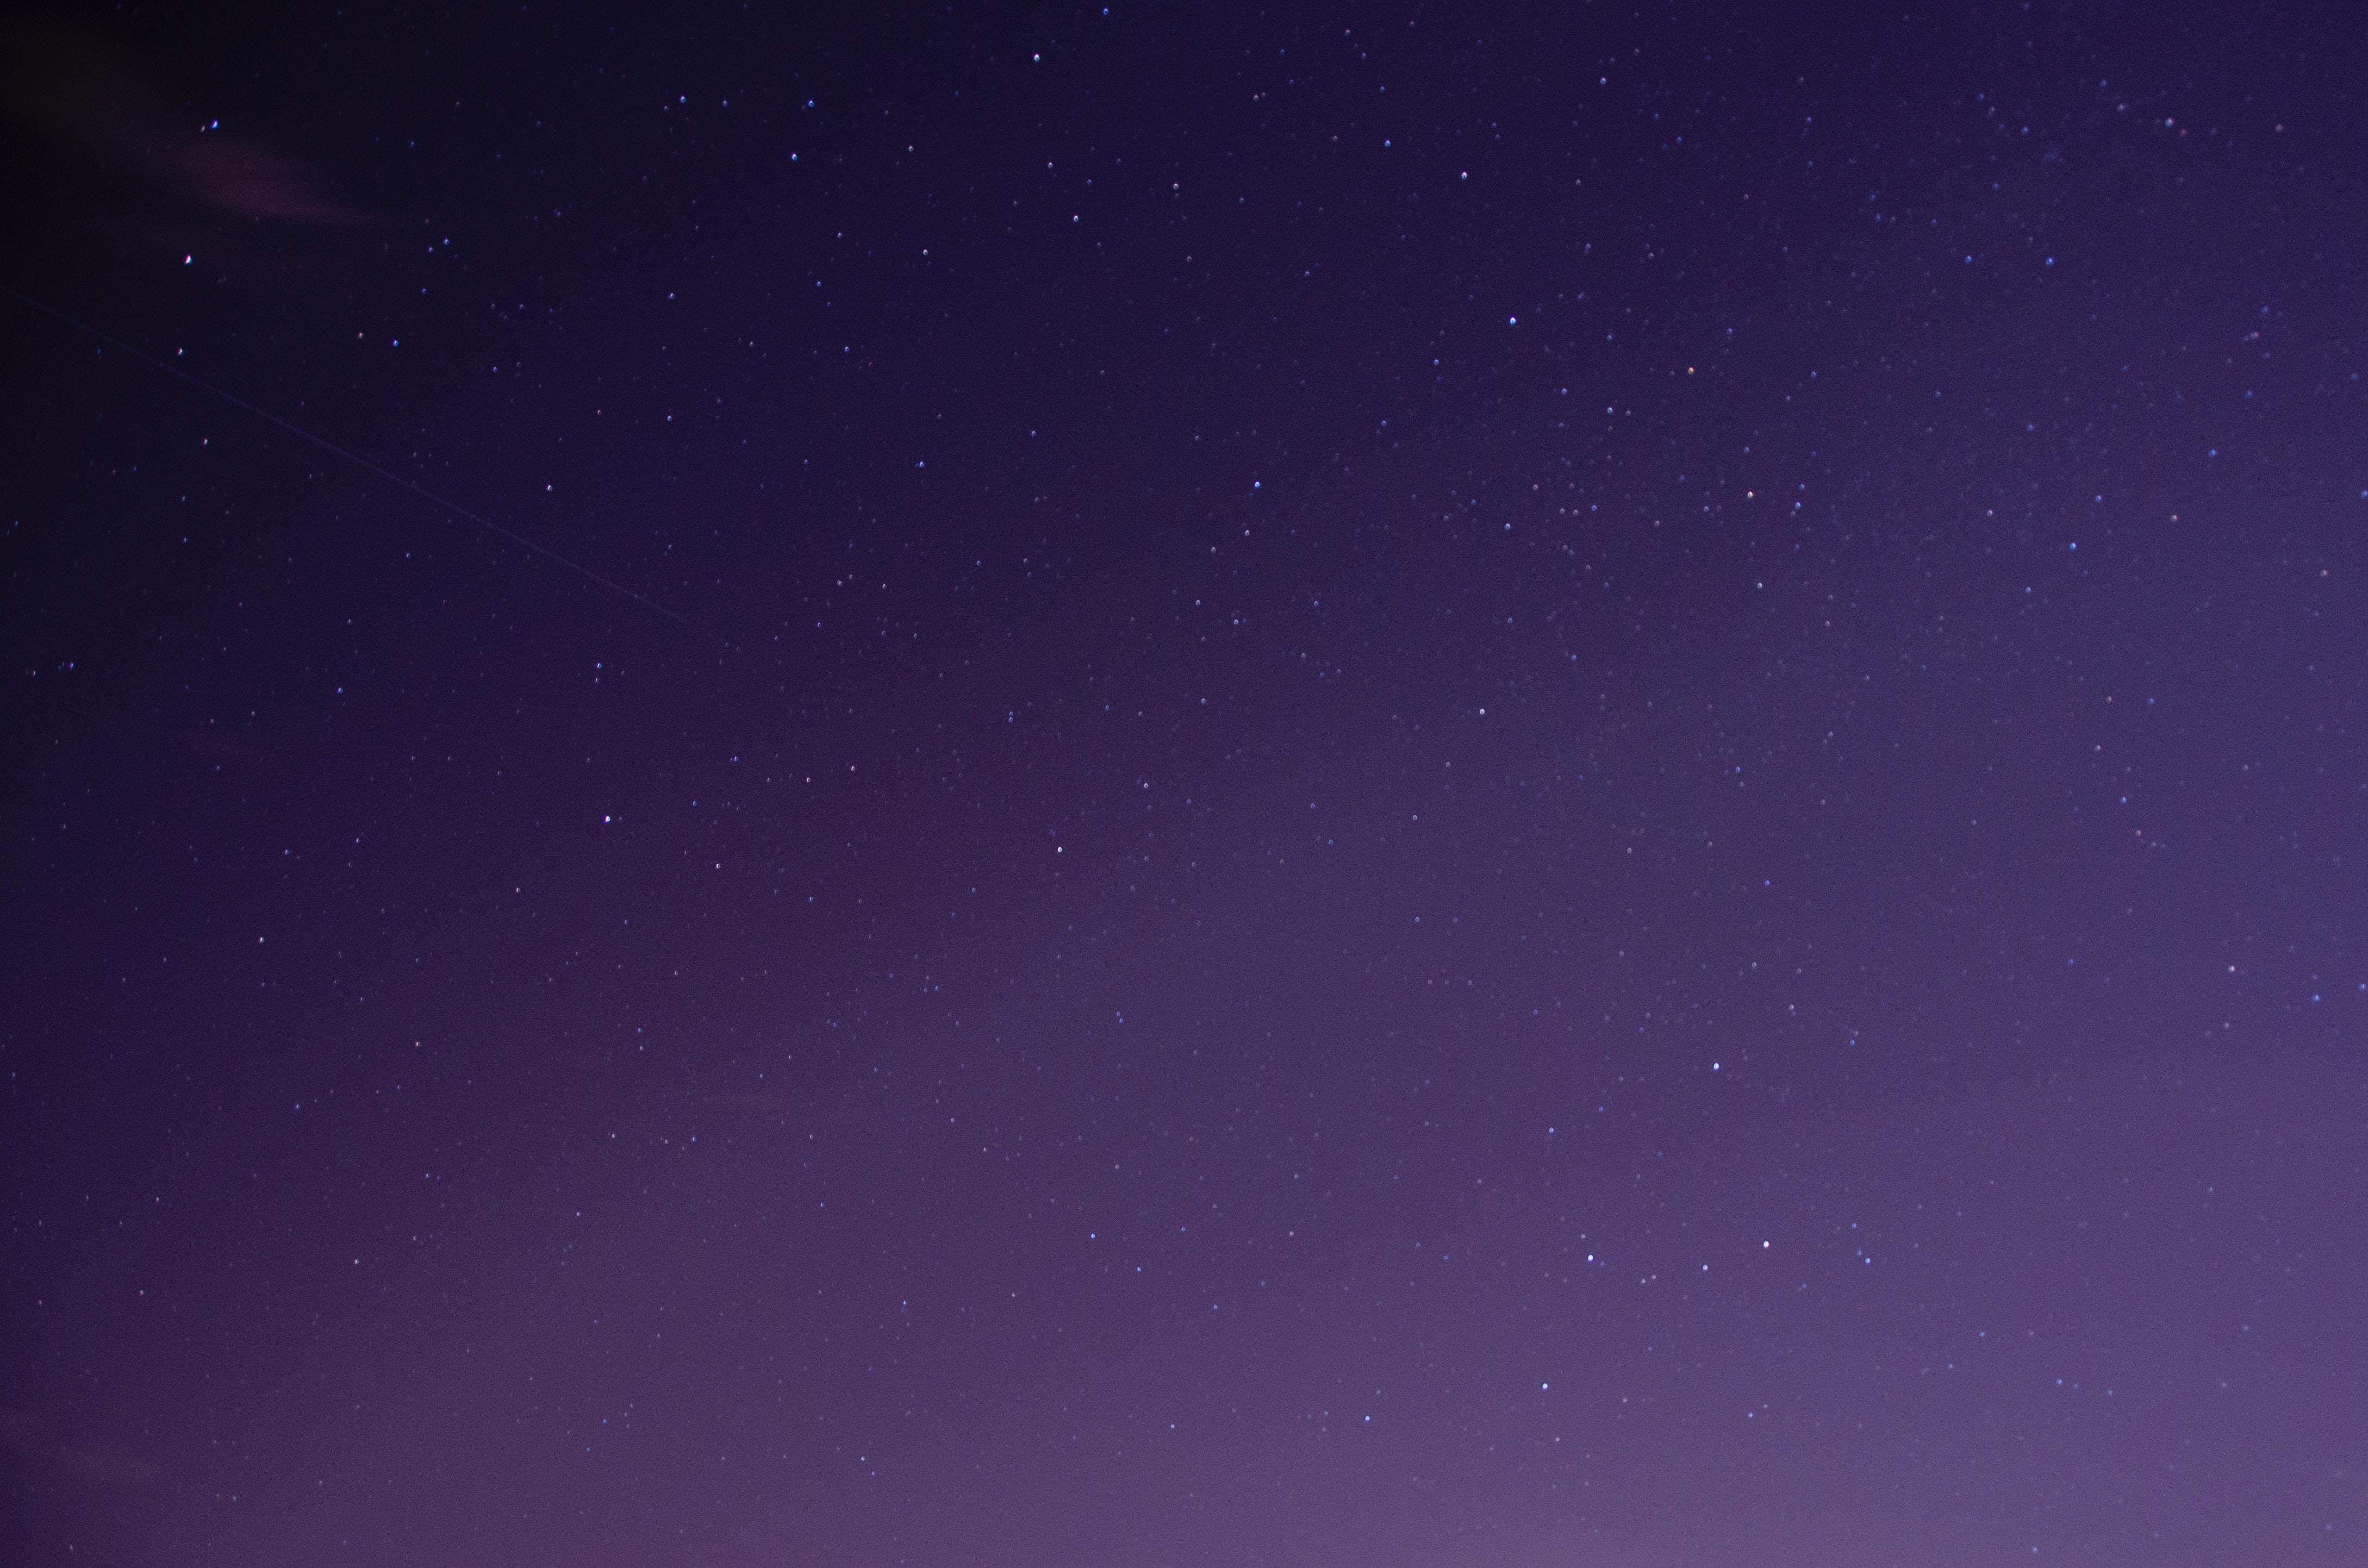 starry purple sky 4k gd